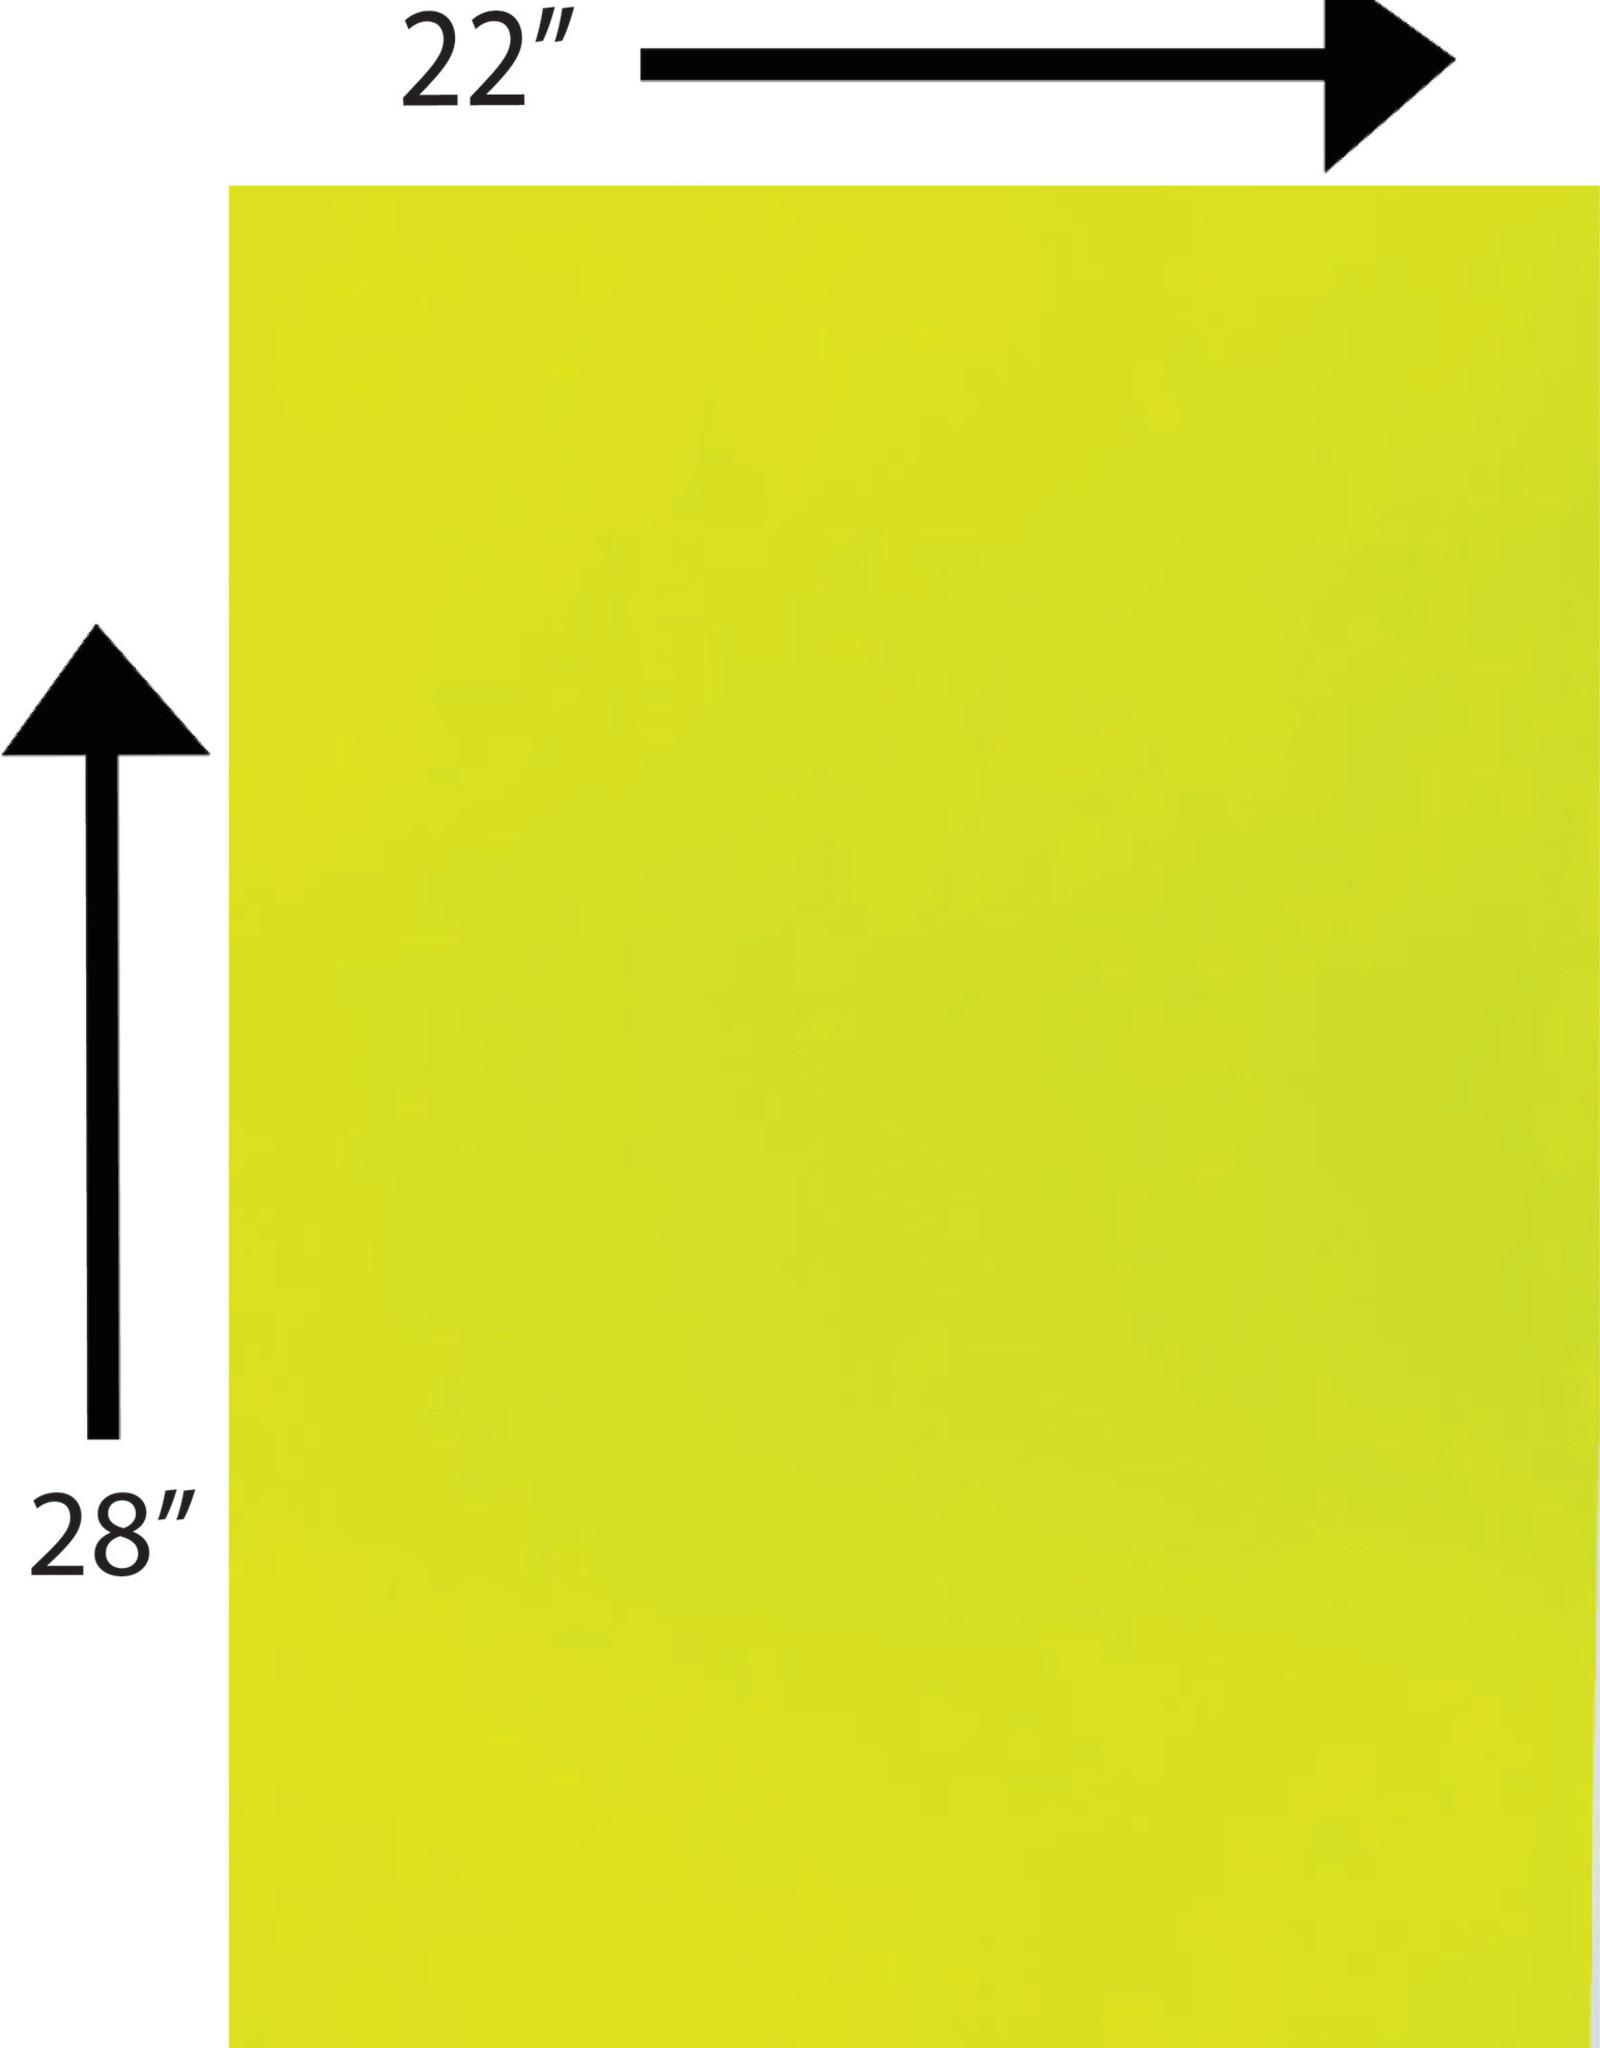 Bristol Board 185GSM 22 x 28 Inches Fluorescent Yellow